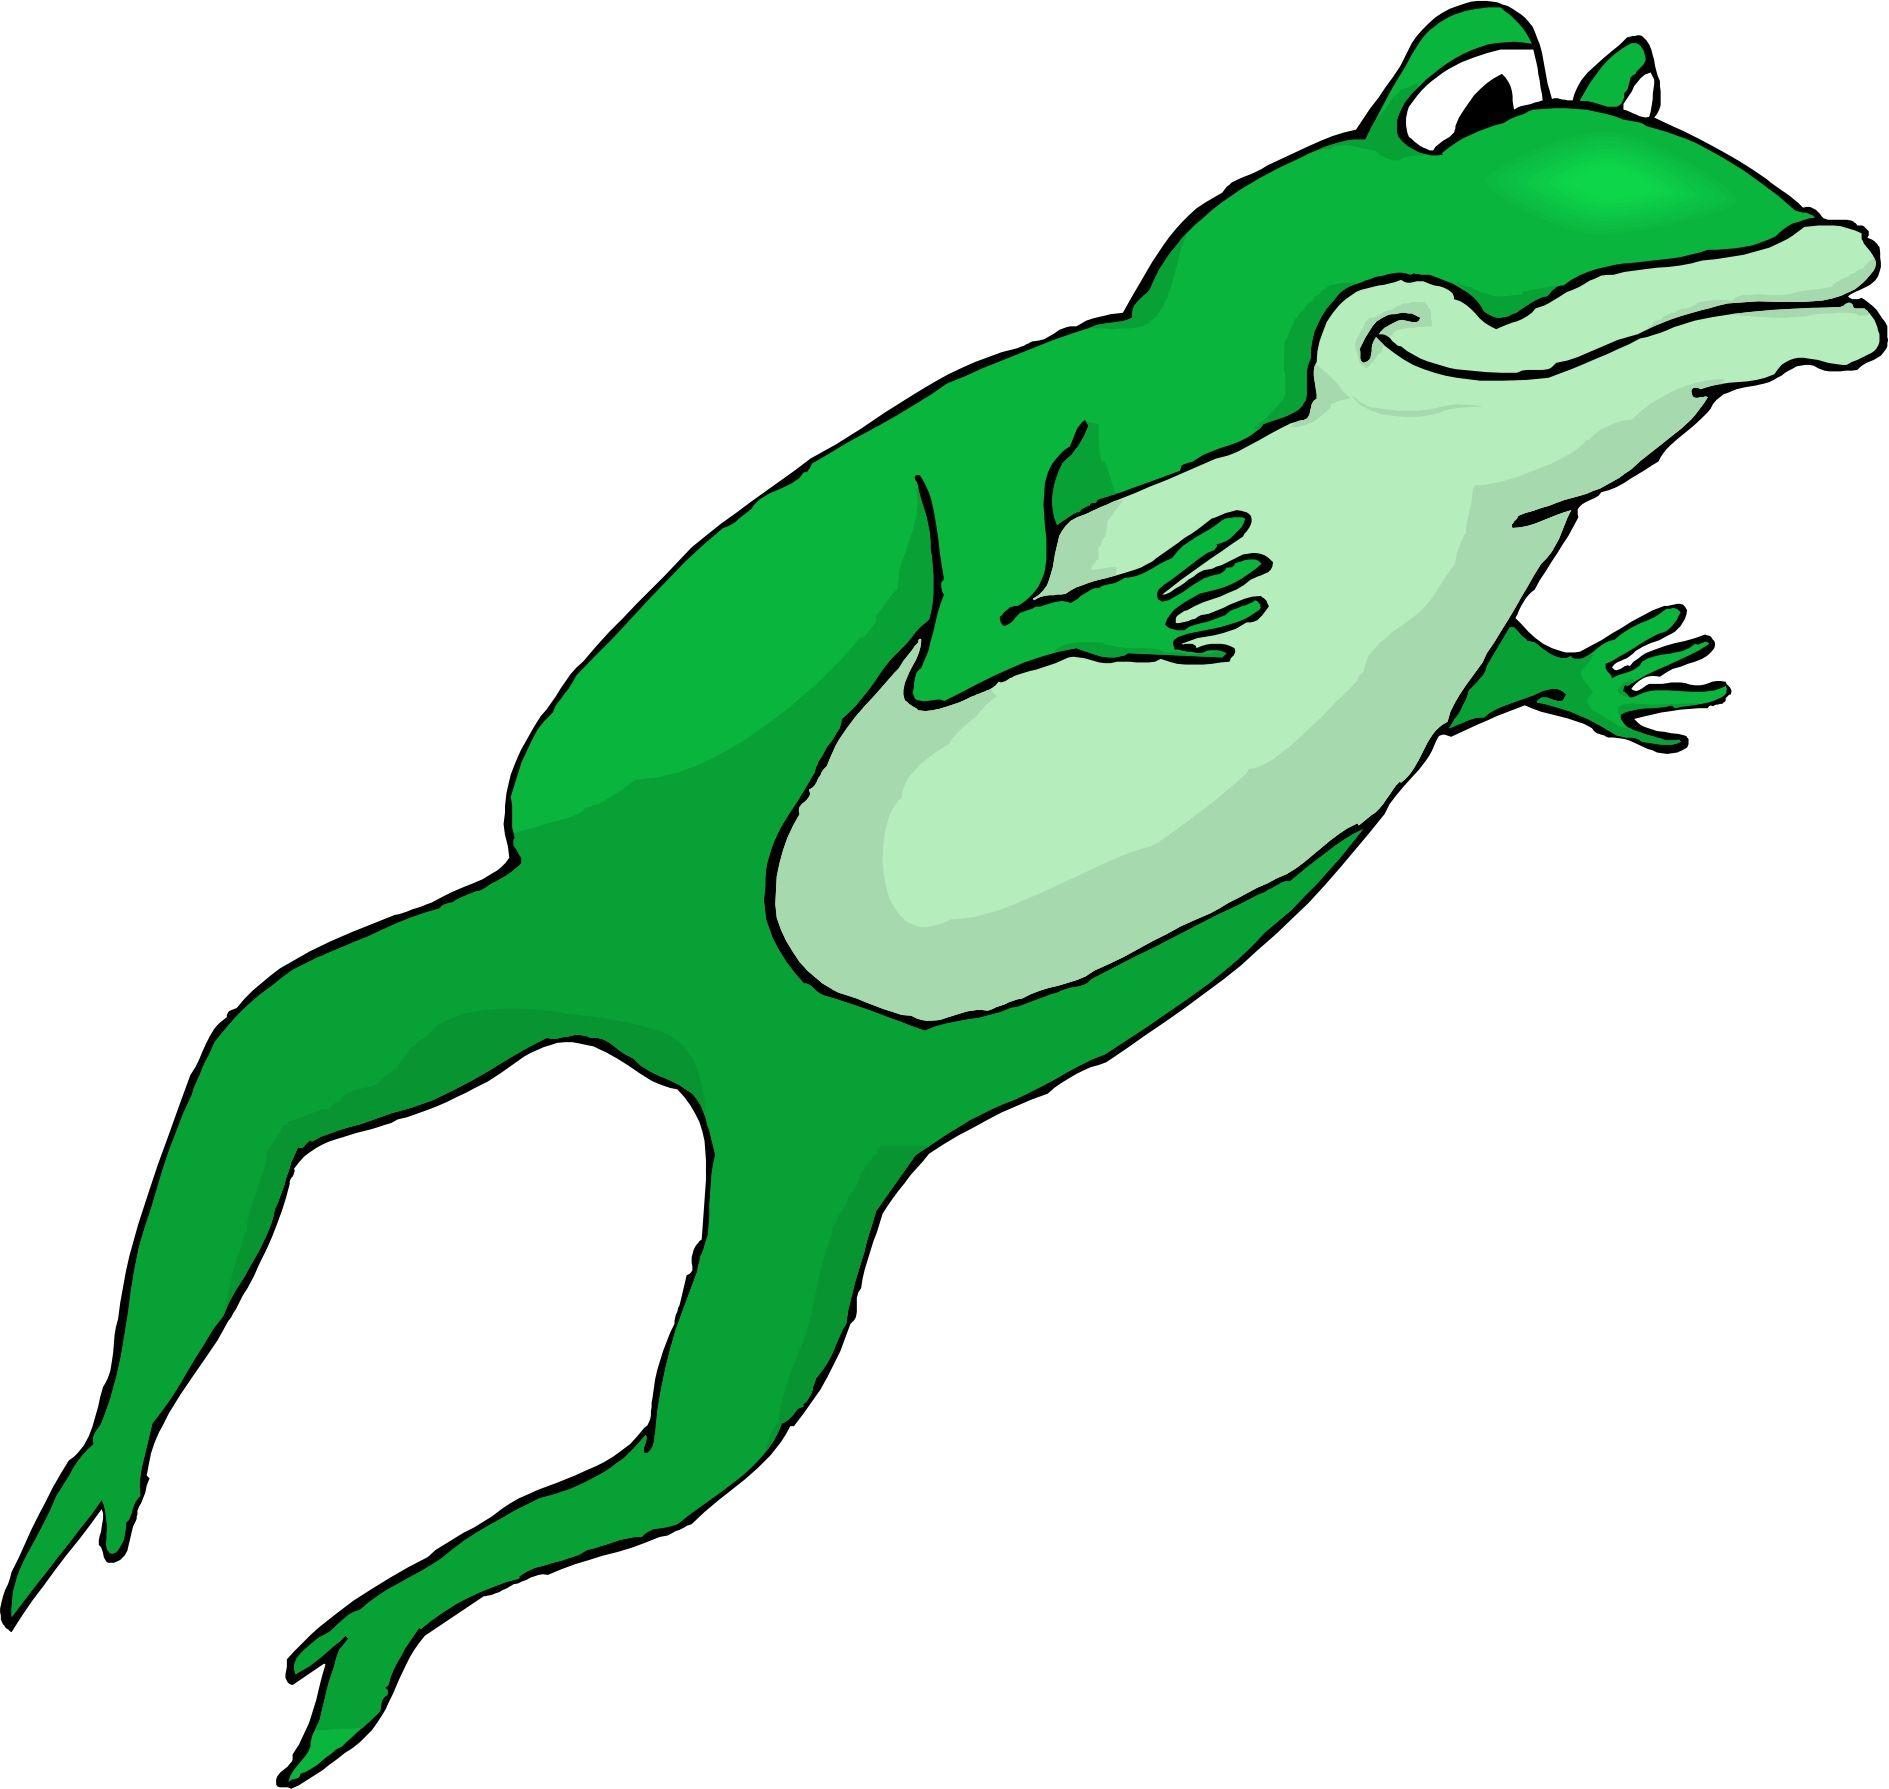 cartoon-jumping-frog-clipart-panda-free-clipart-images ...